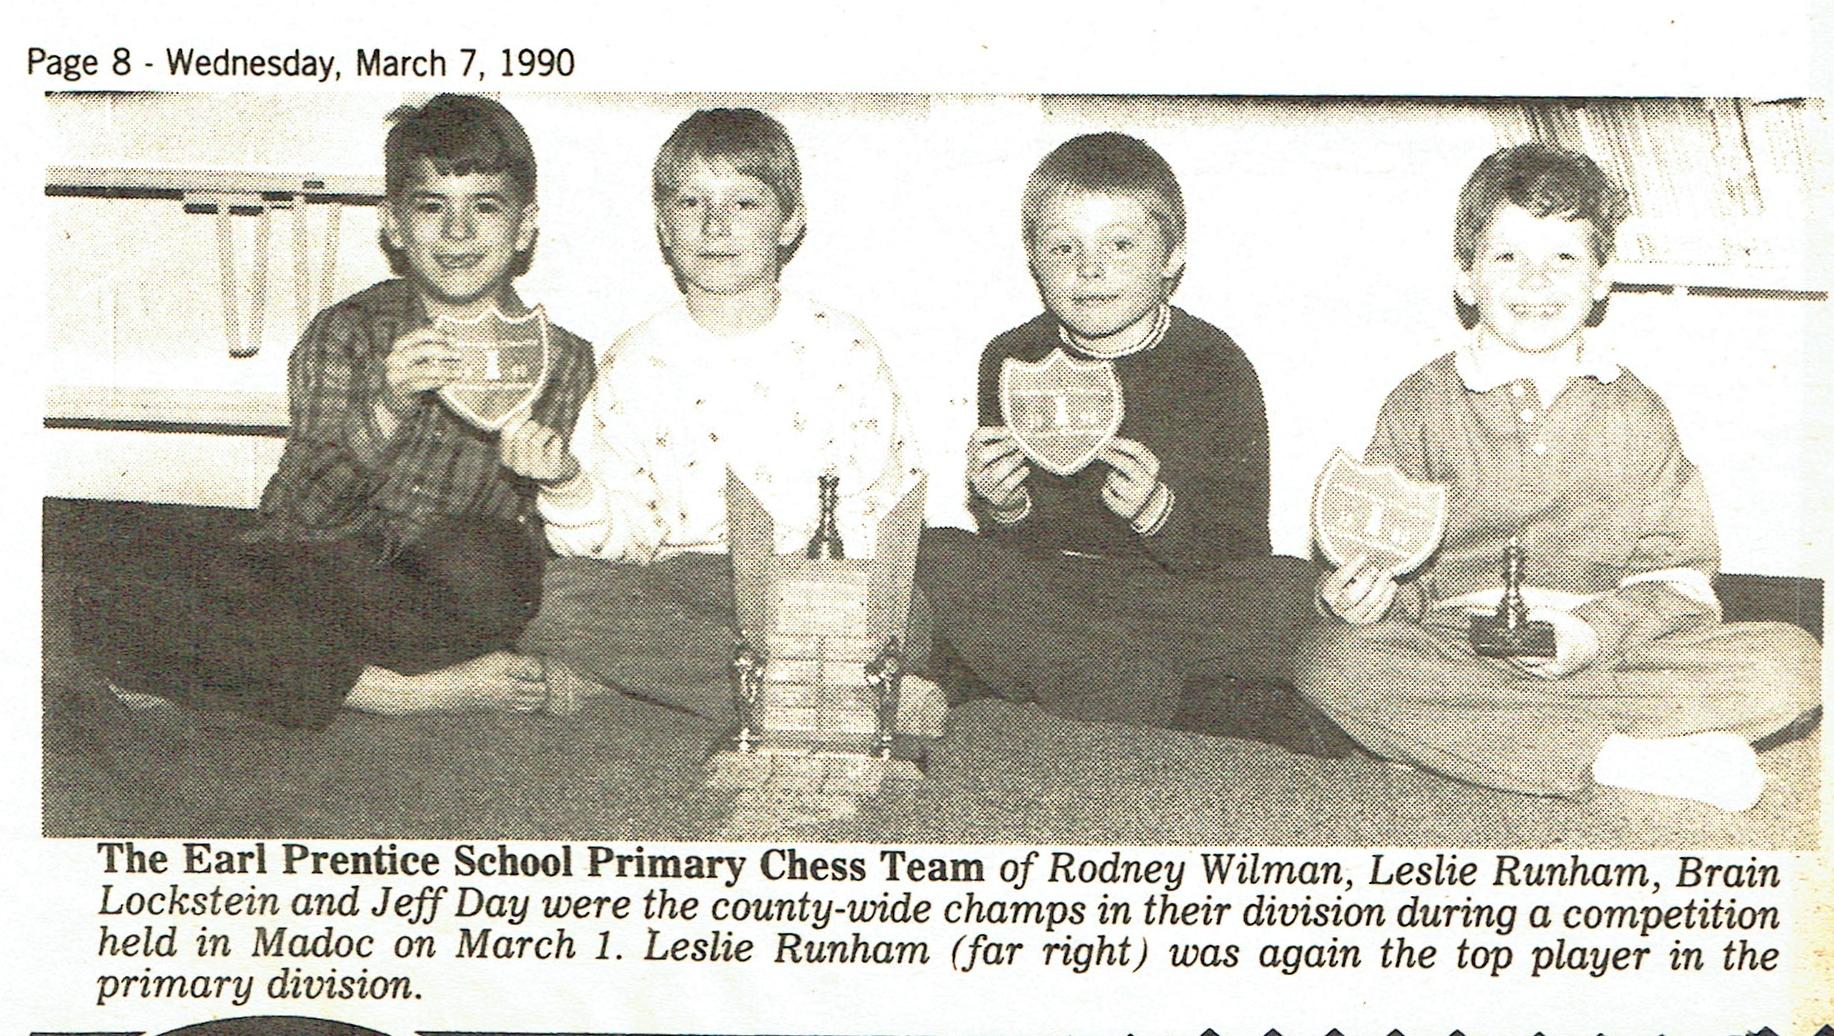 Earl Prenitce Chess Club, 1990